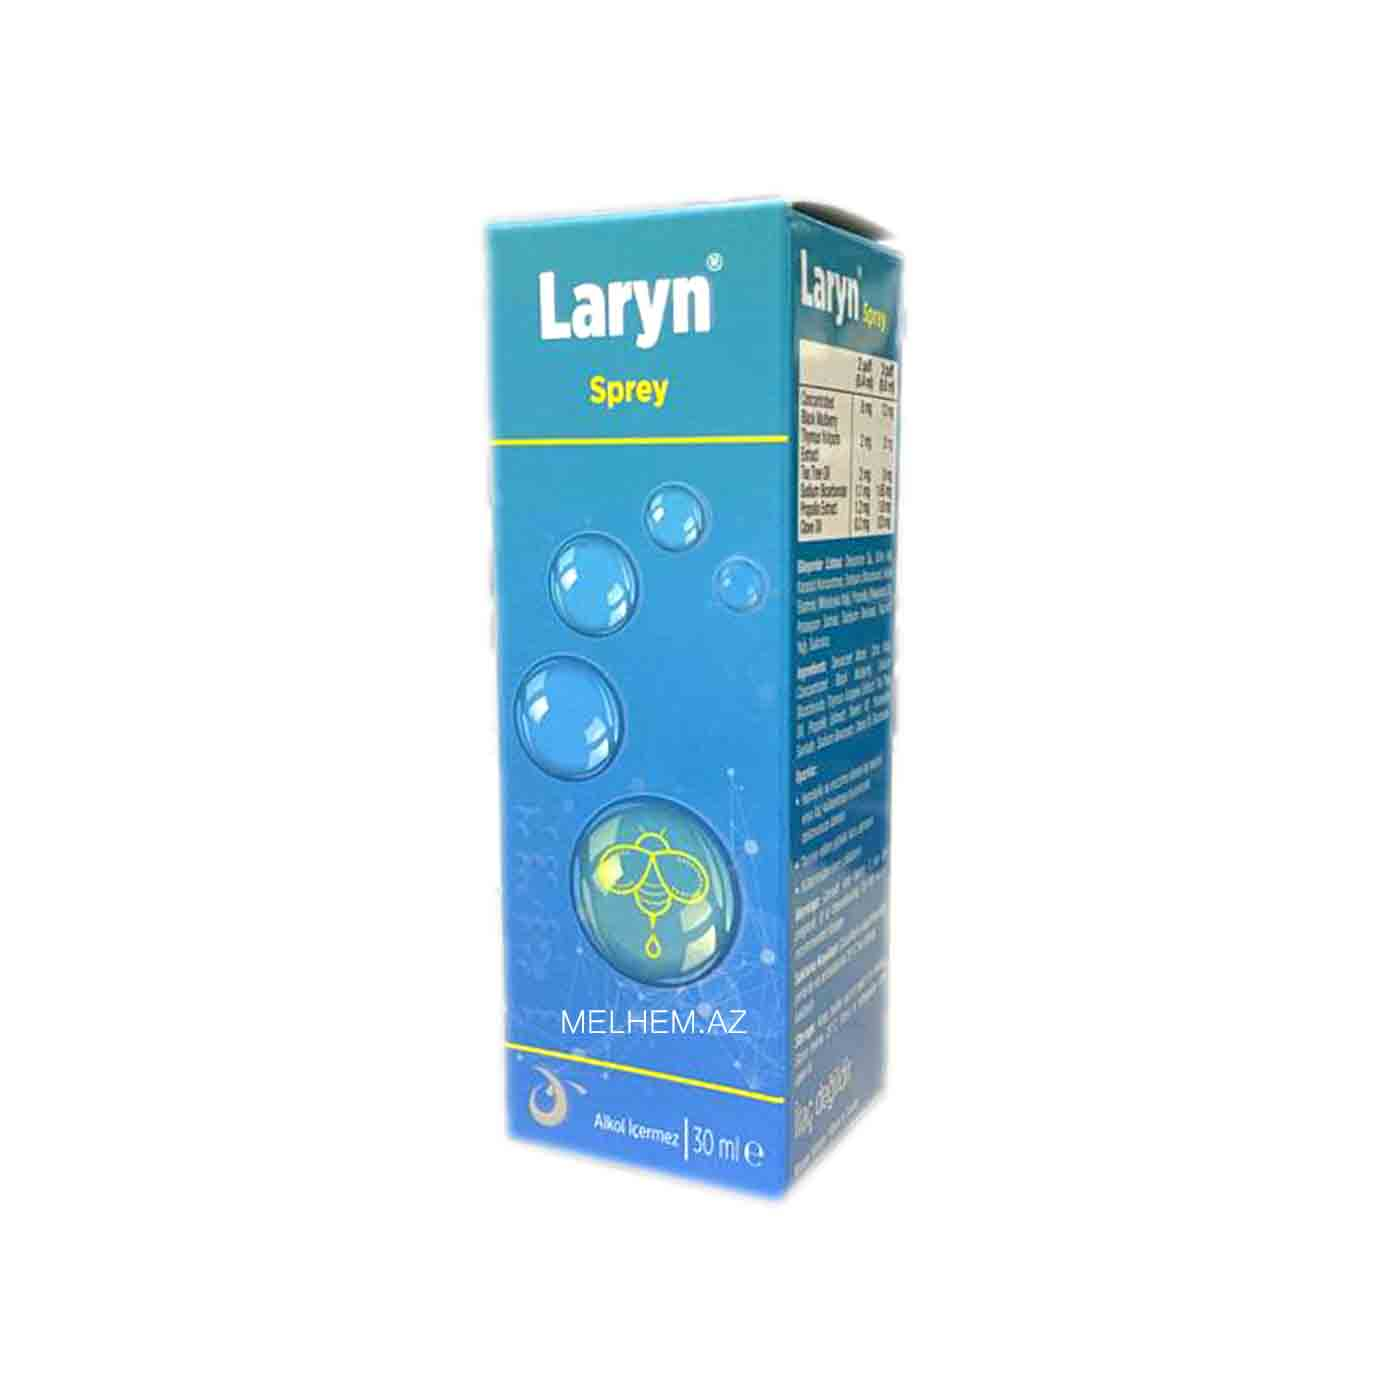 LARYN SPREY 30 ML